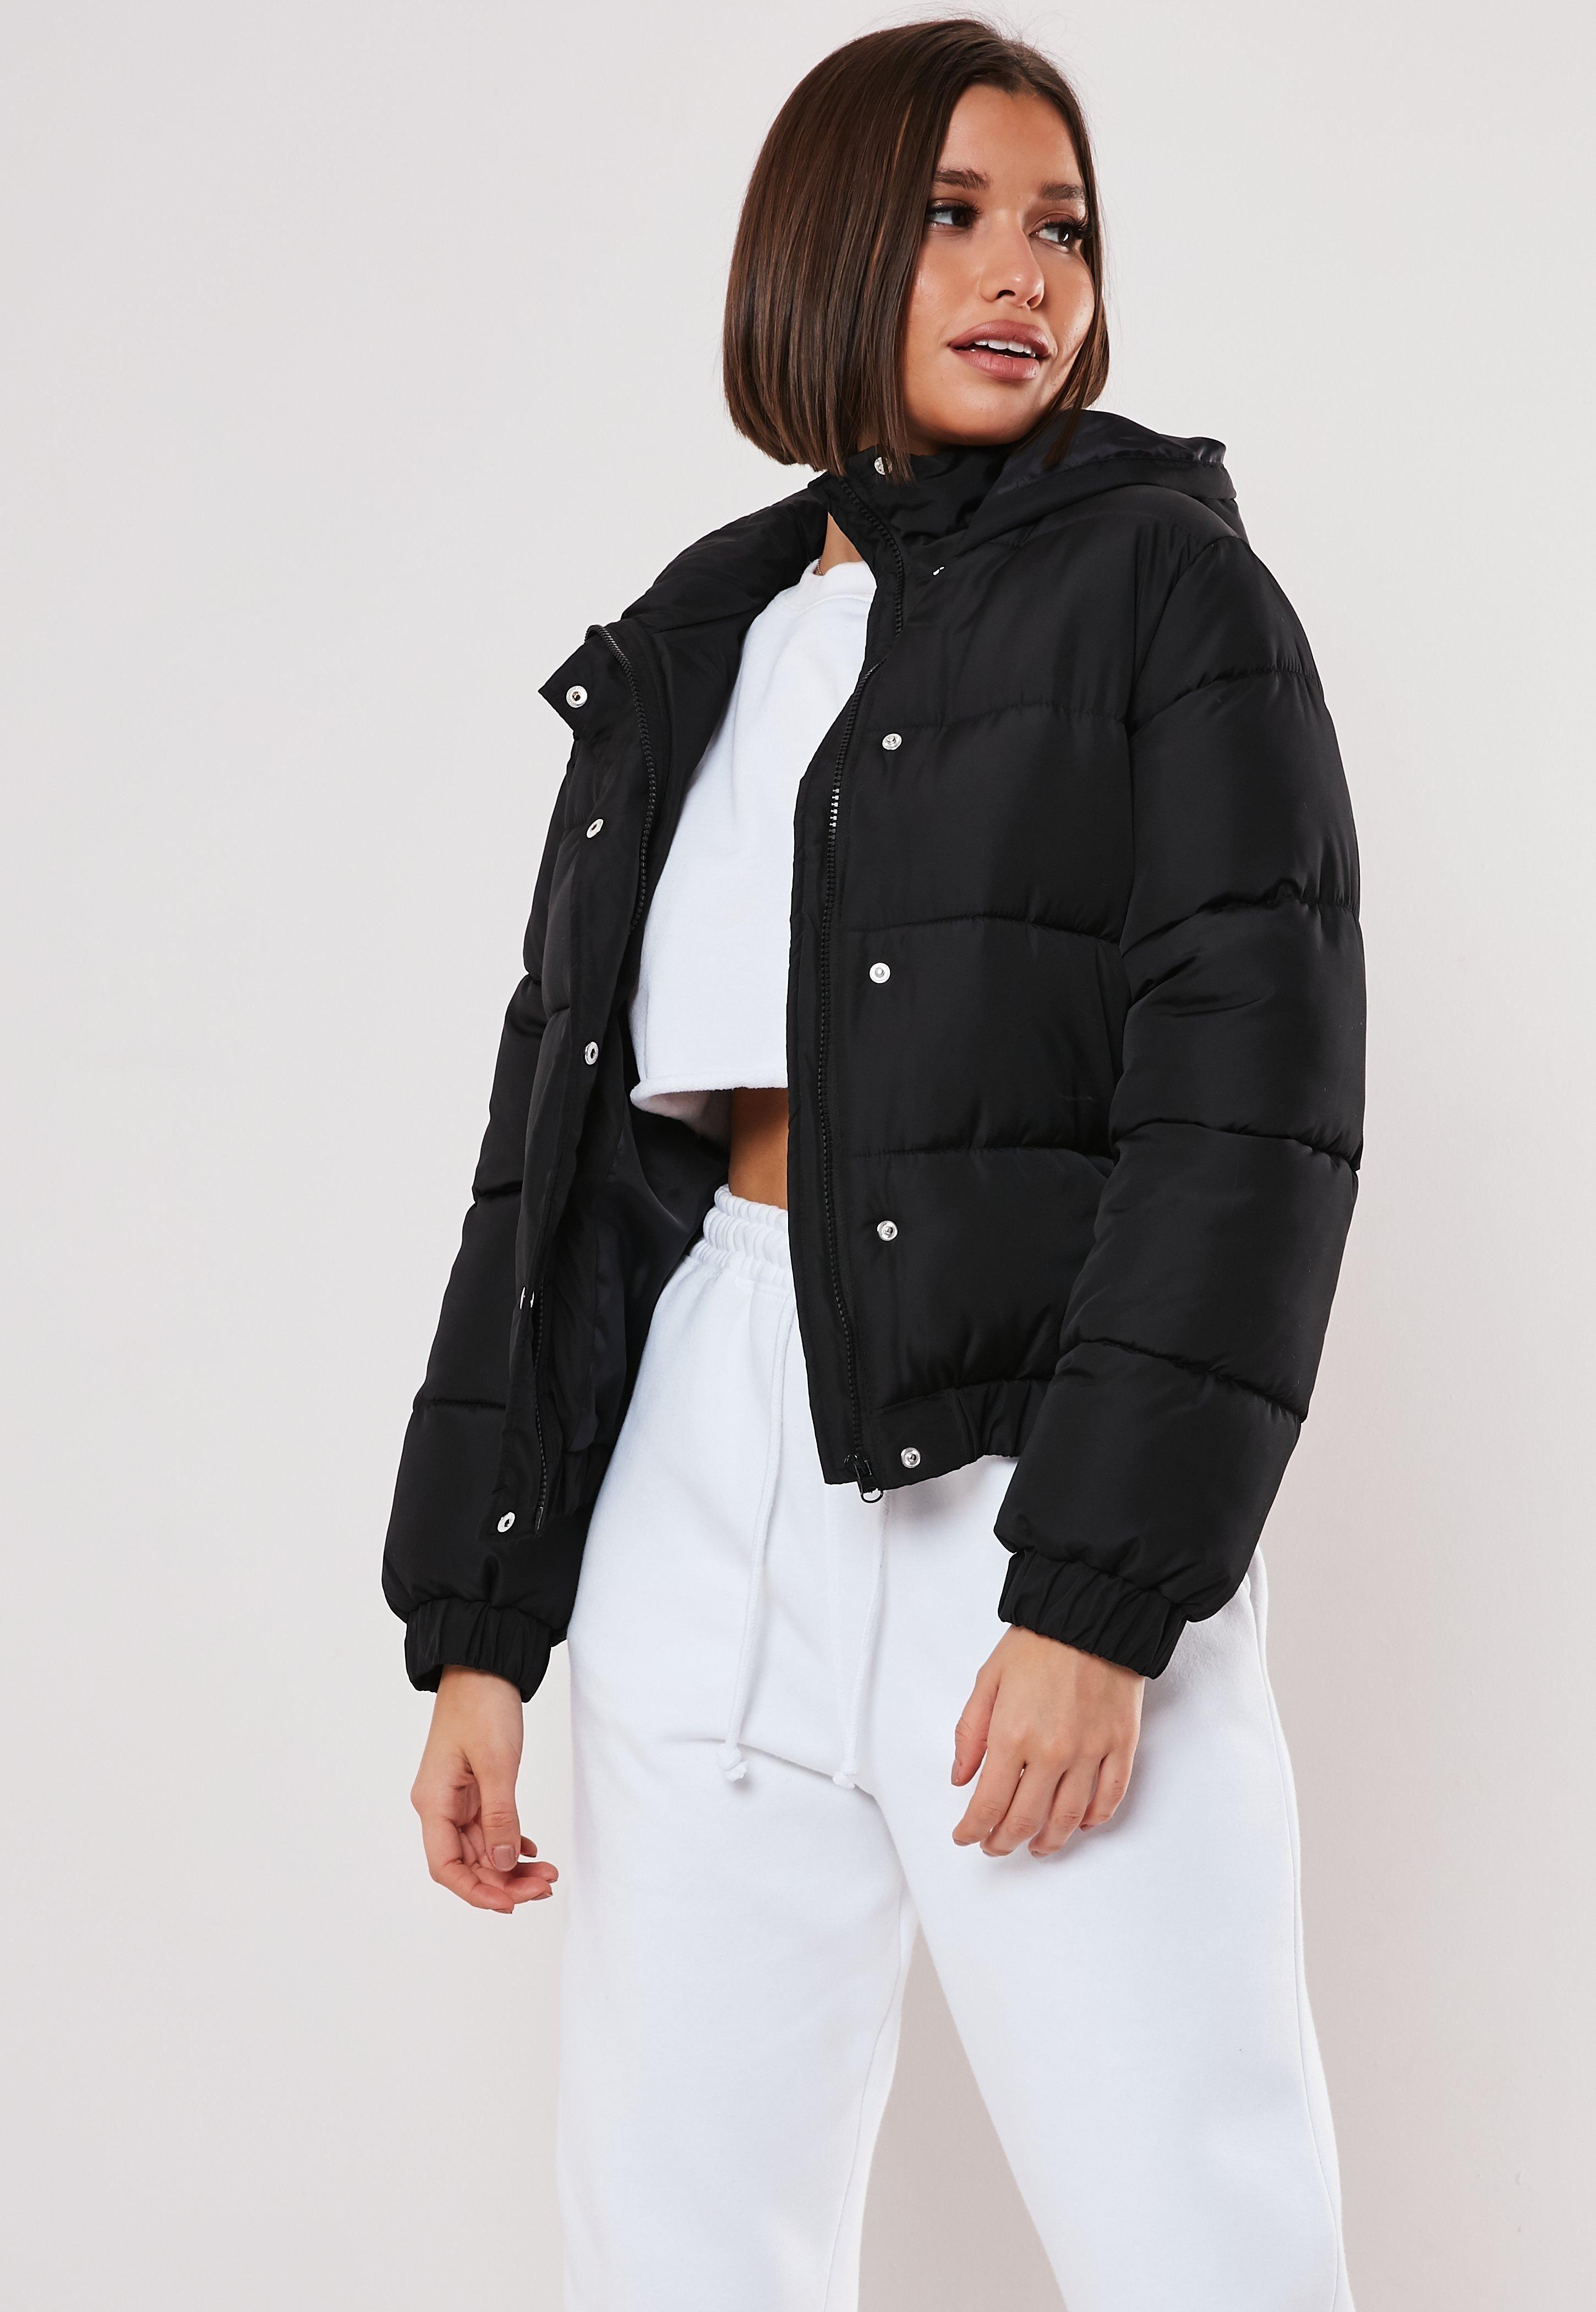 Black Puffer Jacket Sponsored Black Sponsored Puffer Jacket Black Puffer Jacket Puffer Jacket Outfit Fashion [ 4200 x 2900 Pixel ]